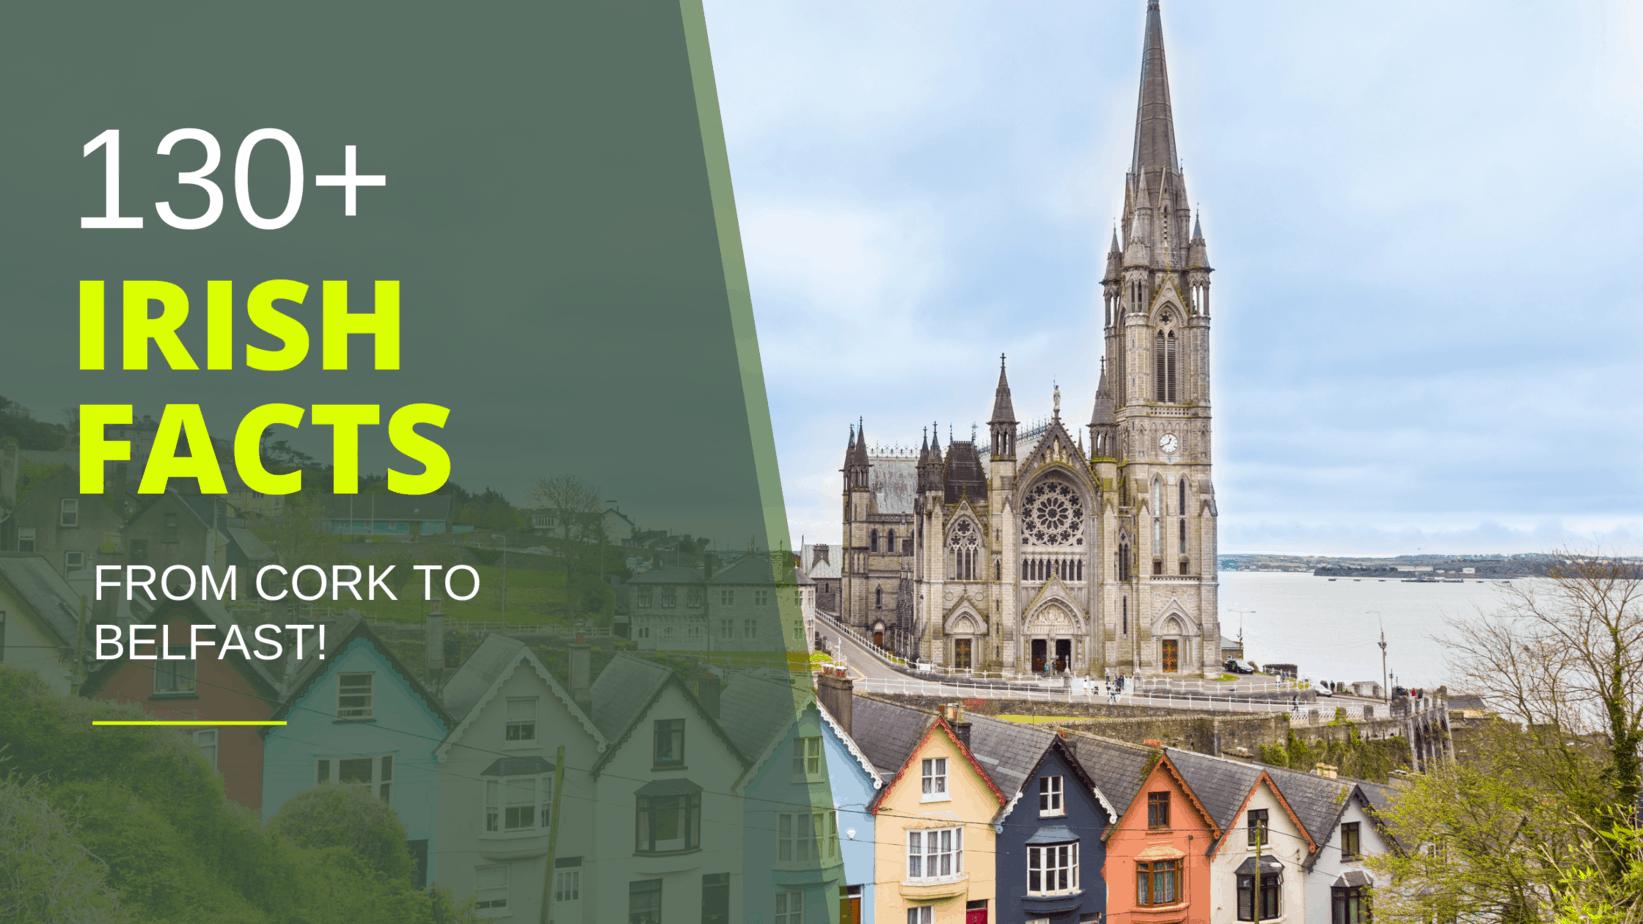 130+ Irish facts